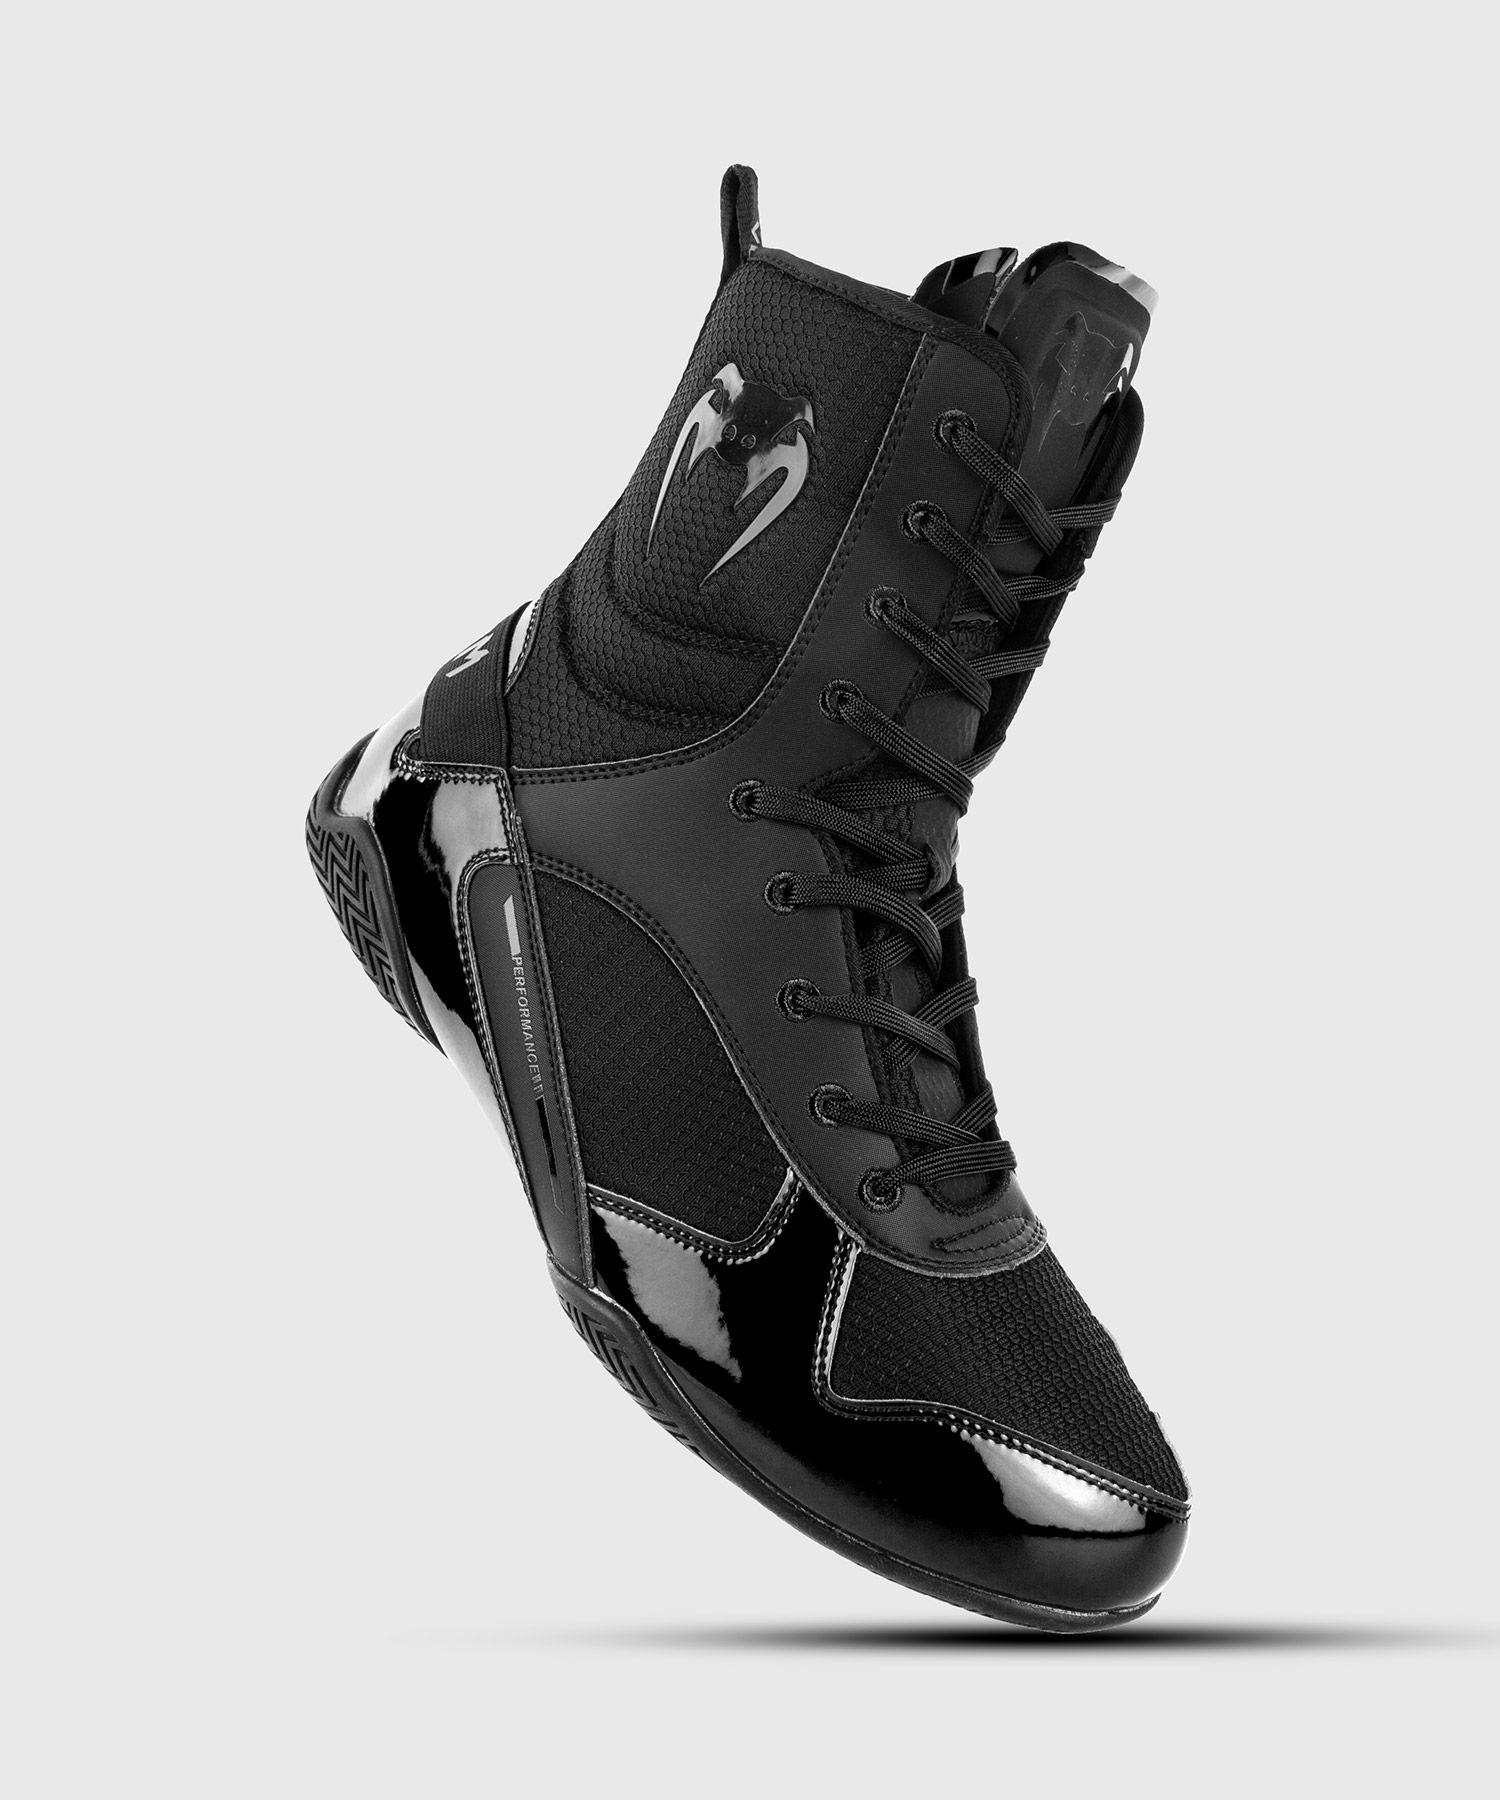 Venum Elite Boxing Shoes - Black/Black